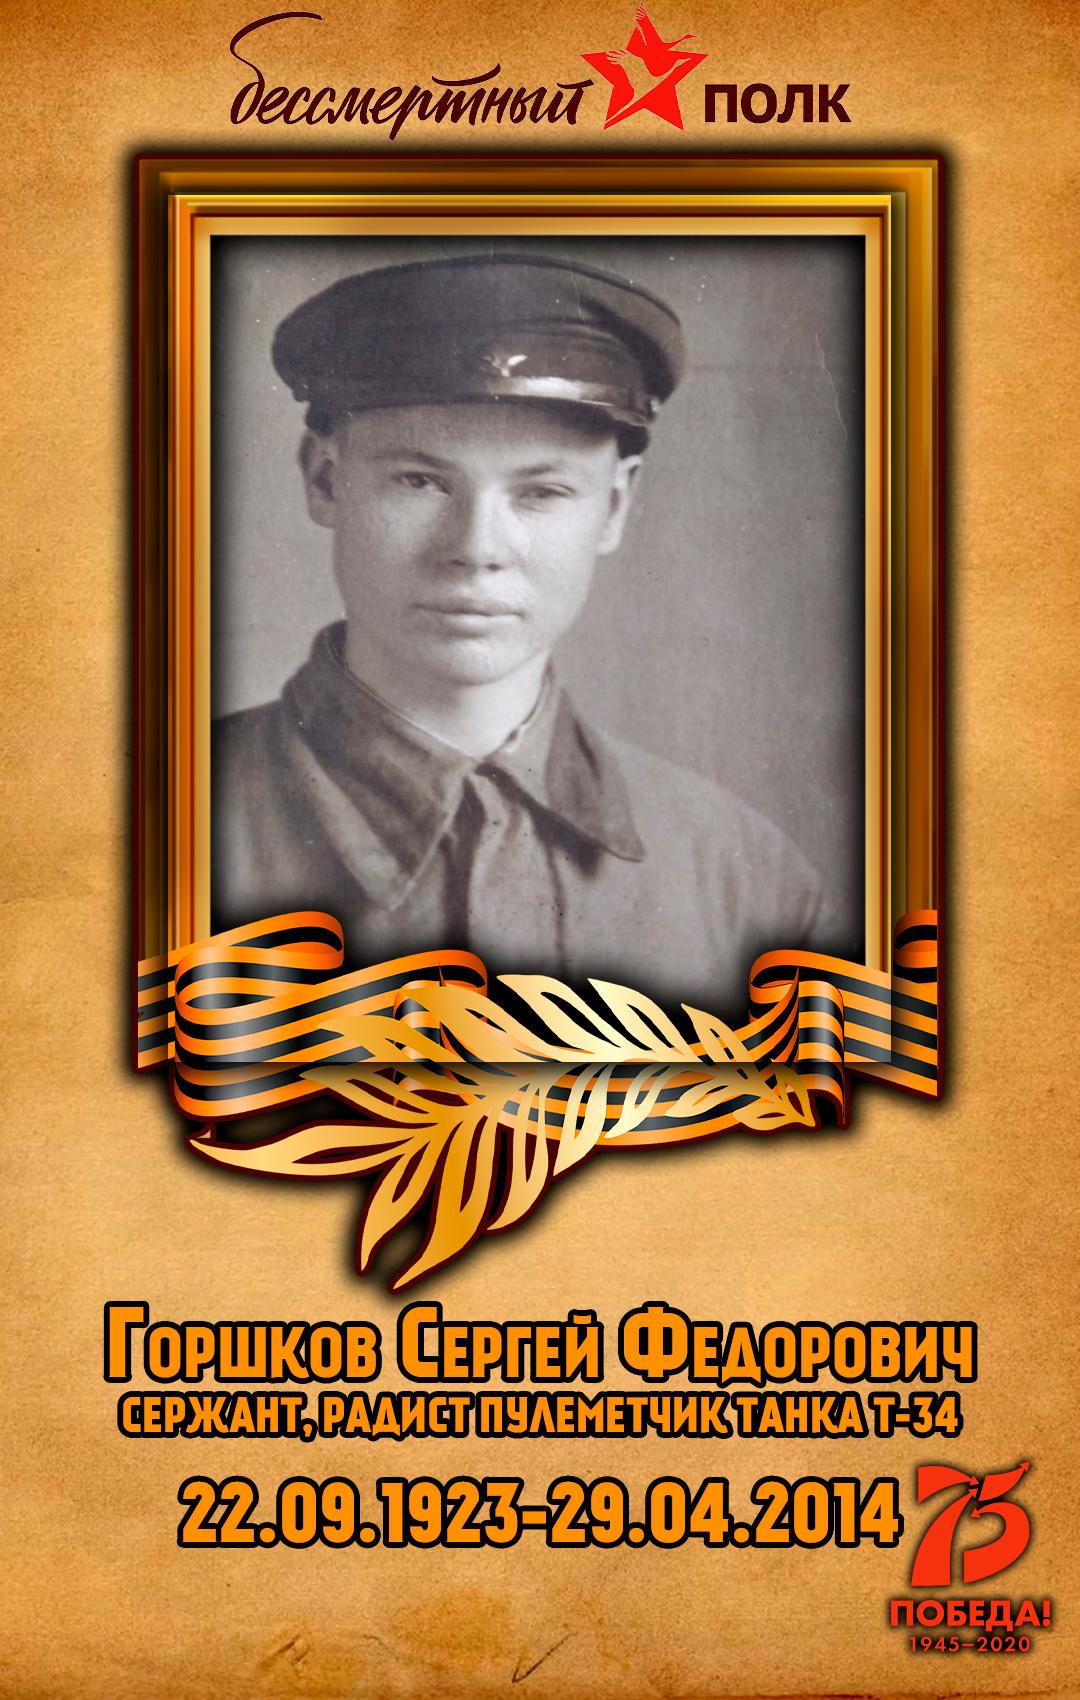 Горшков-Сергей-Федорович